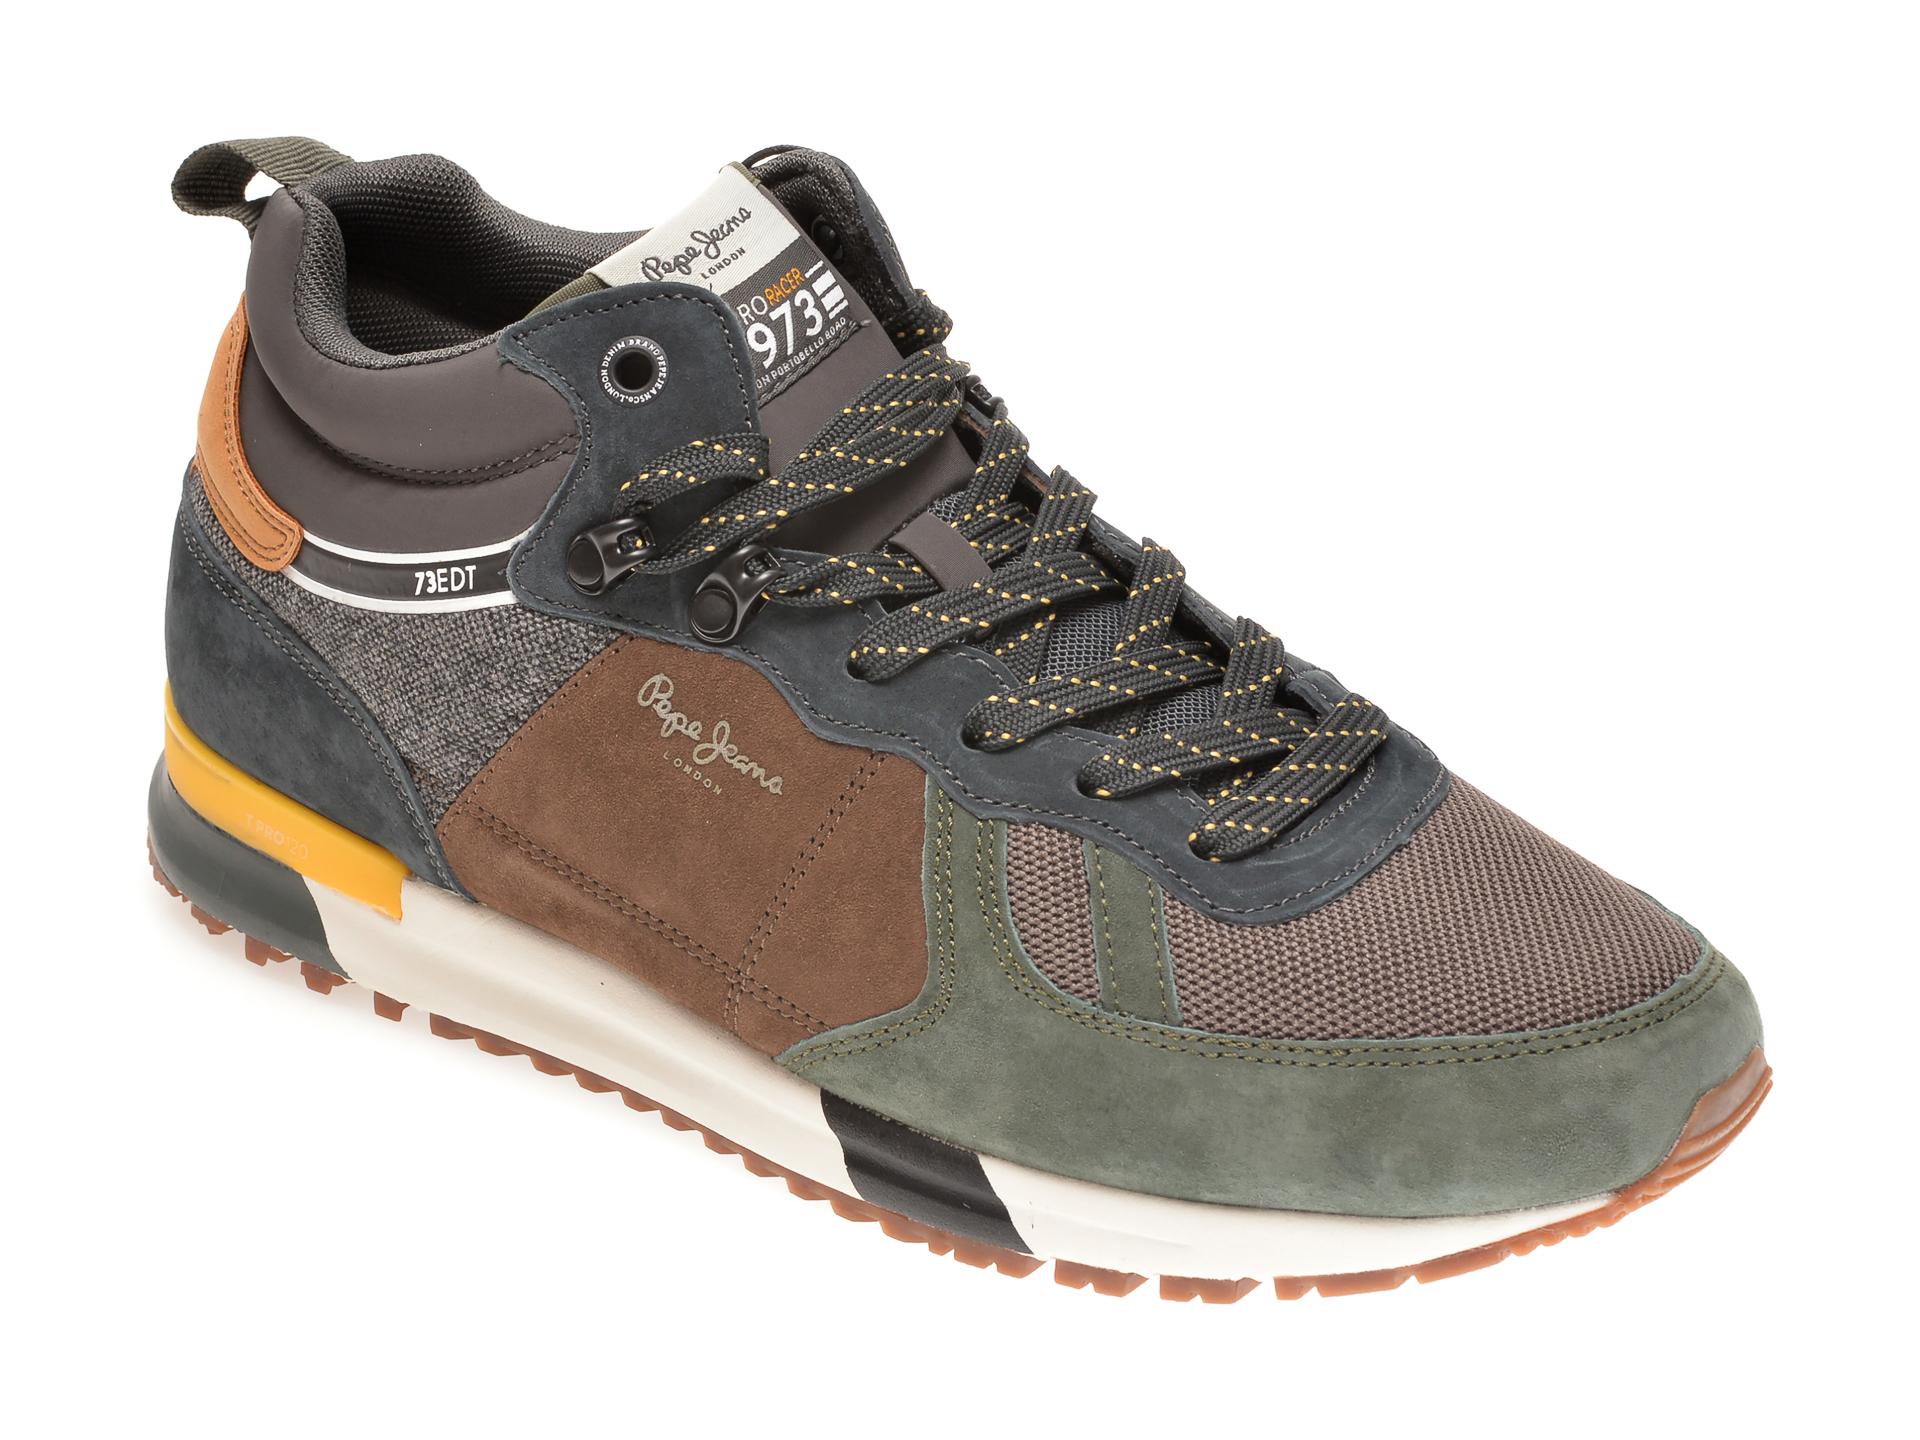 Pantofi sport PEPE JEANS kaki, MS30663, din material textil si piele intoarsa imagine